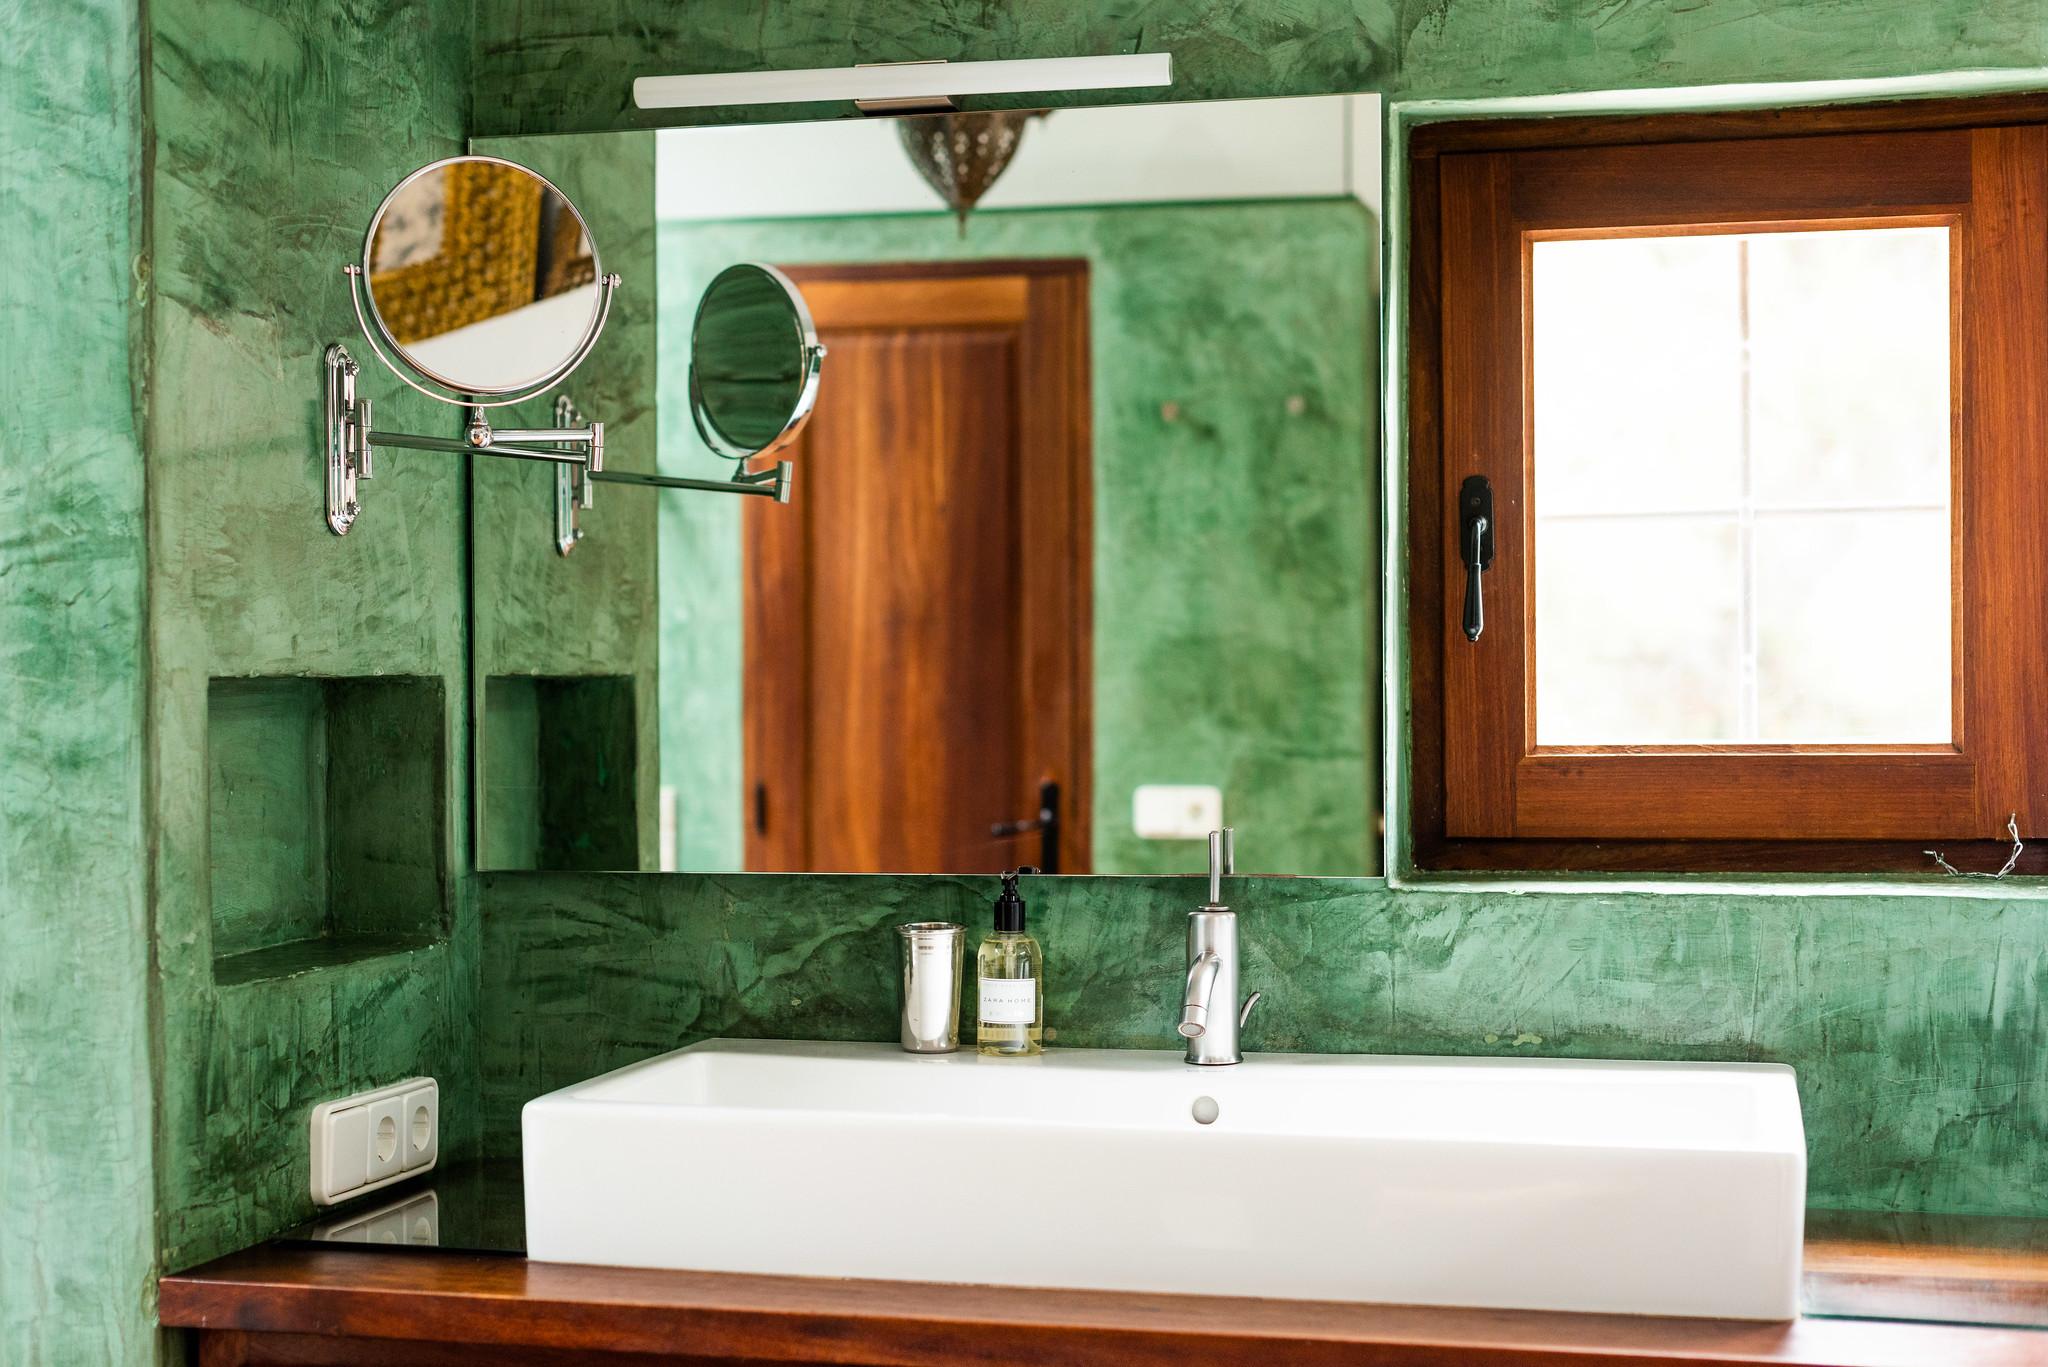 https://www.white-ibiza.com/wp-content/uploads/2020/05/white-ibiza-villas-can-lyra-green-bathroom.jpg